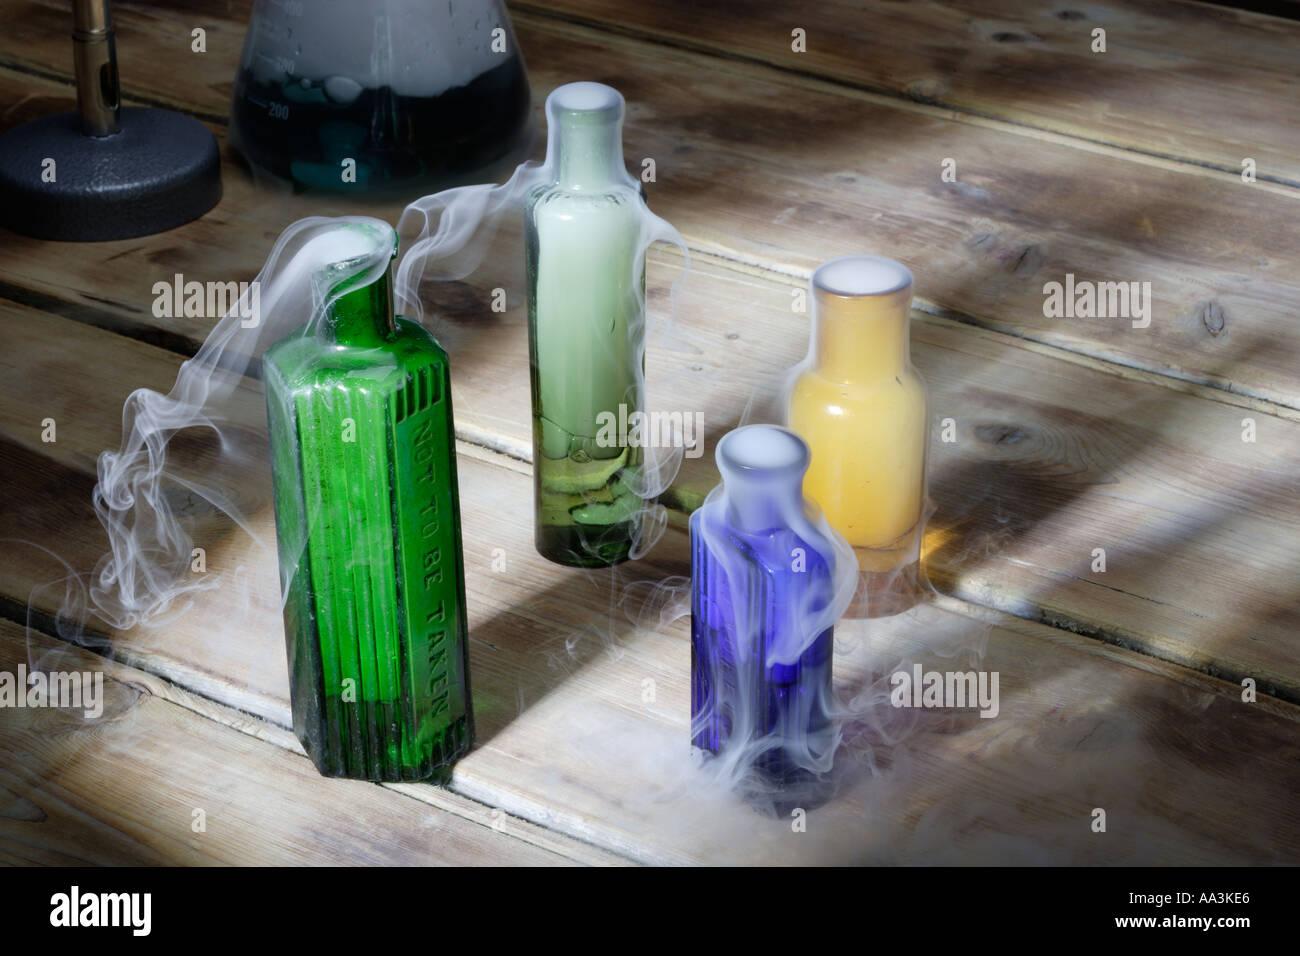 Potions smoking in laboratory - Stock Image